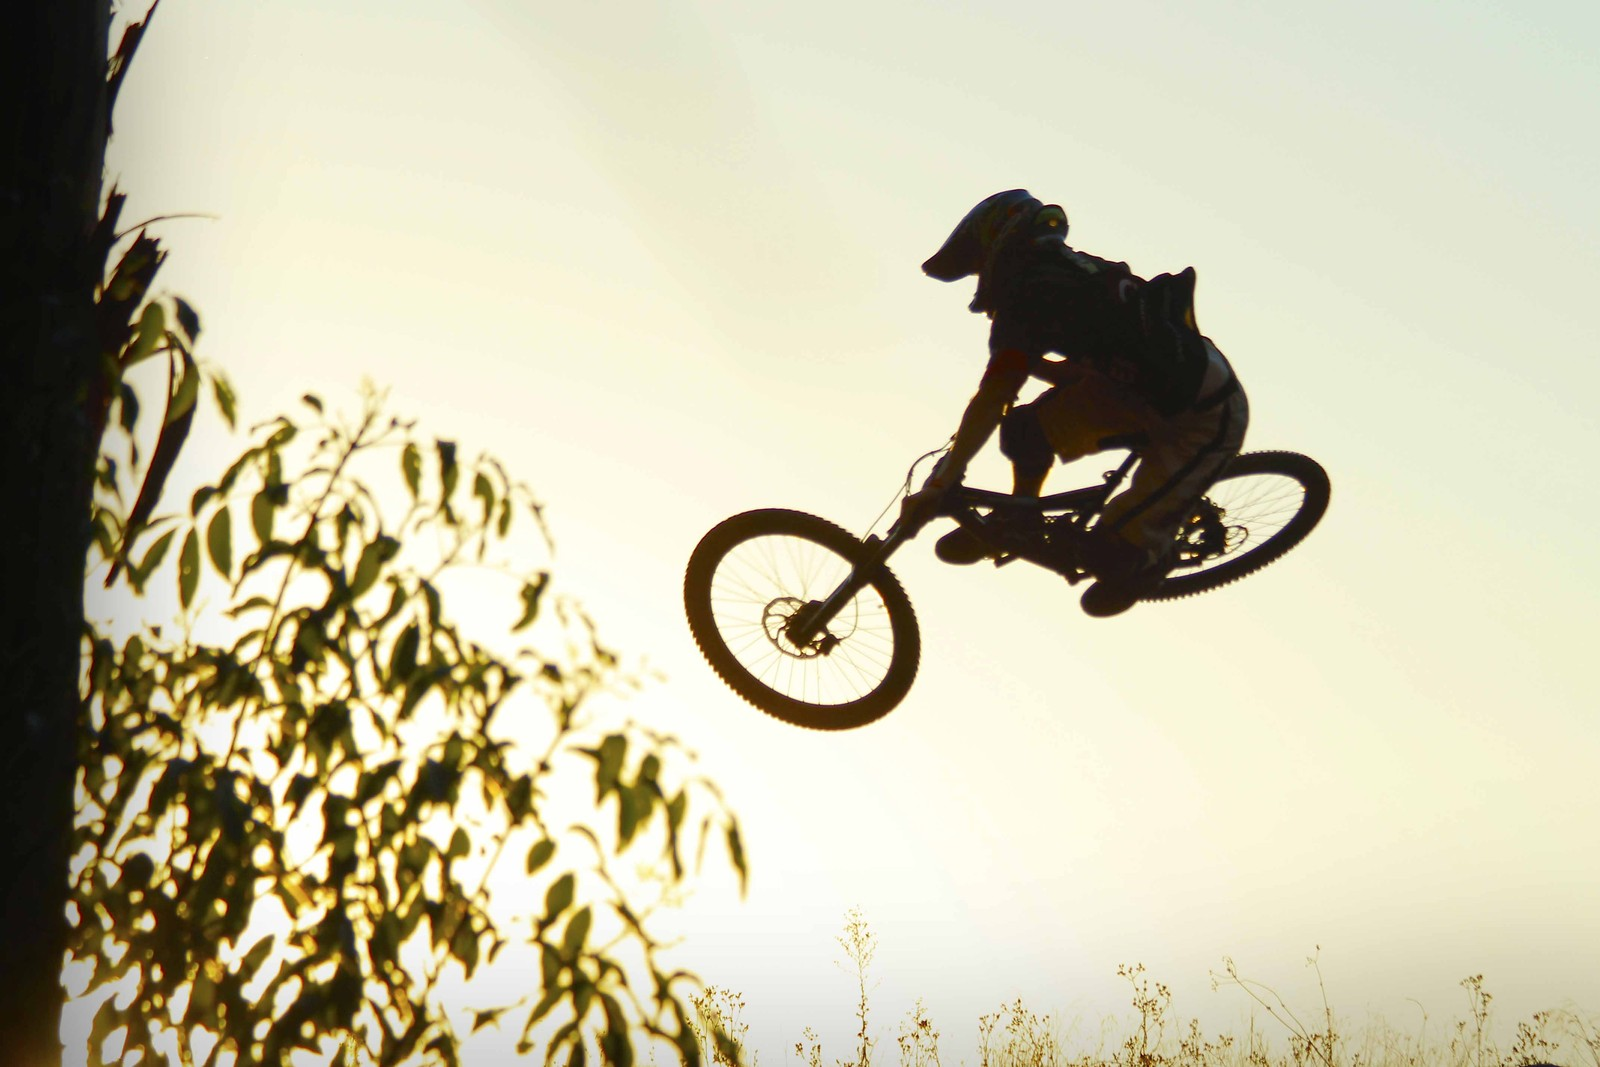 Vance Bennet hits the hip - GnarHuck - Mountain Biking Pictures - Vital MTB